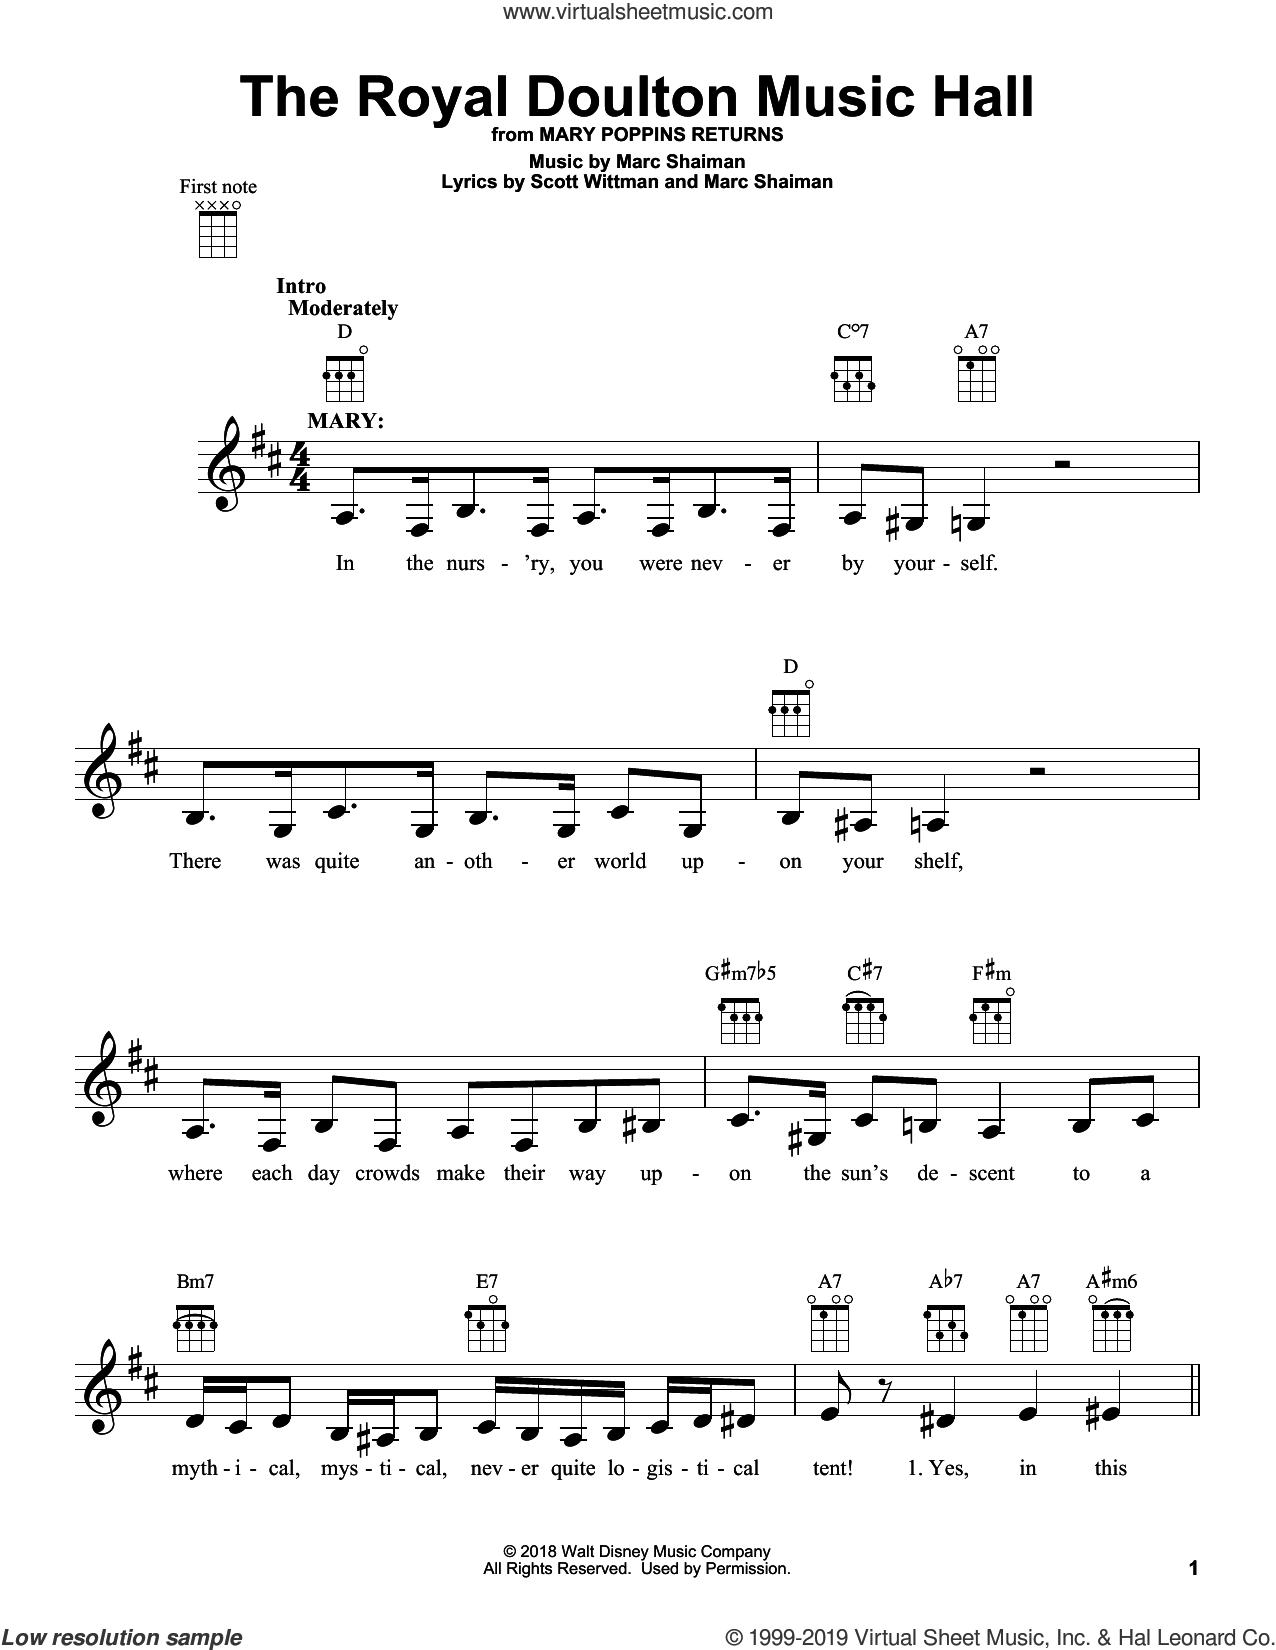 The Royal Doulton Music Hall (from Mary Poppins Returns) sheet music for ukulele by Emily Blunt & Lin-Manuel Miranda, Marc Shaiman and Scott Wittman, intermediate skill level